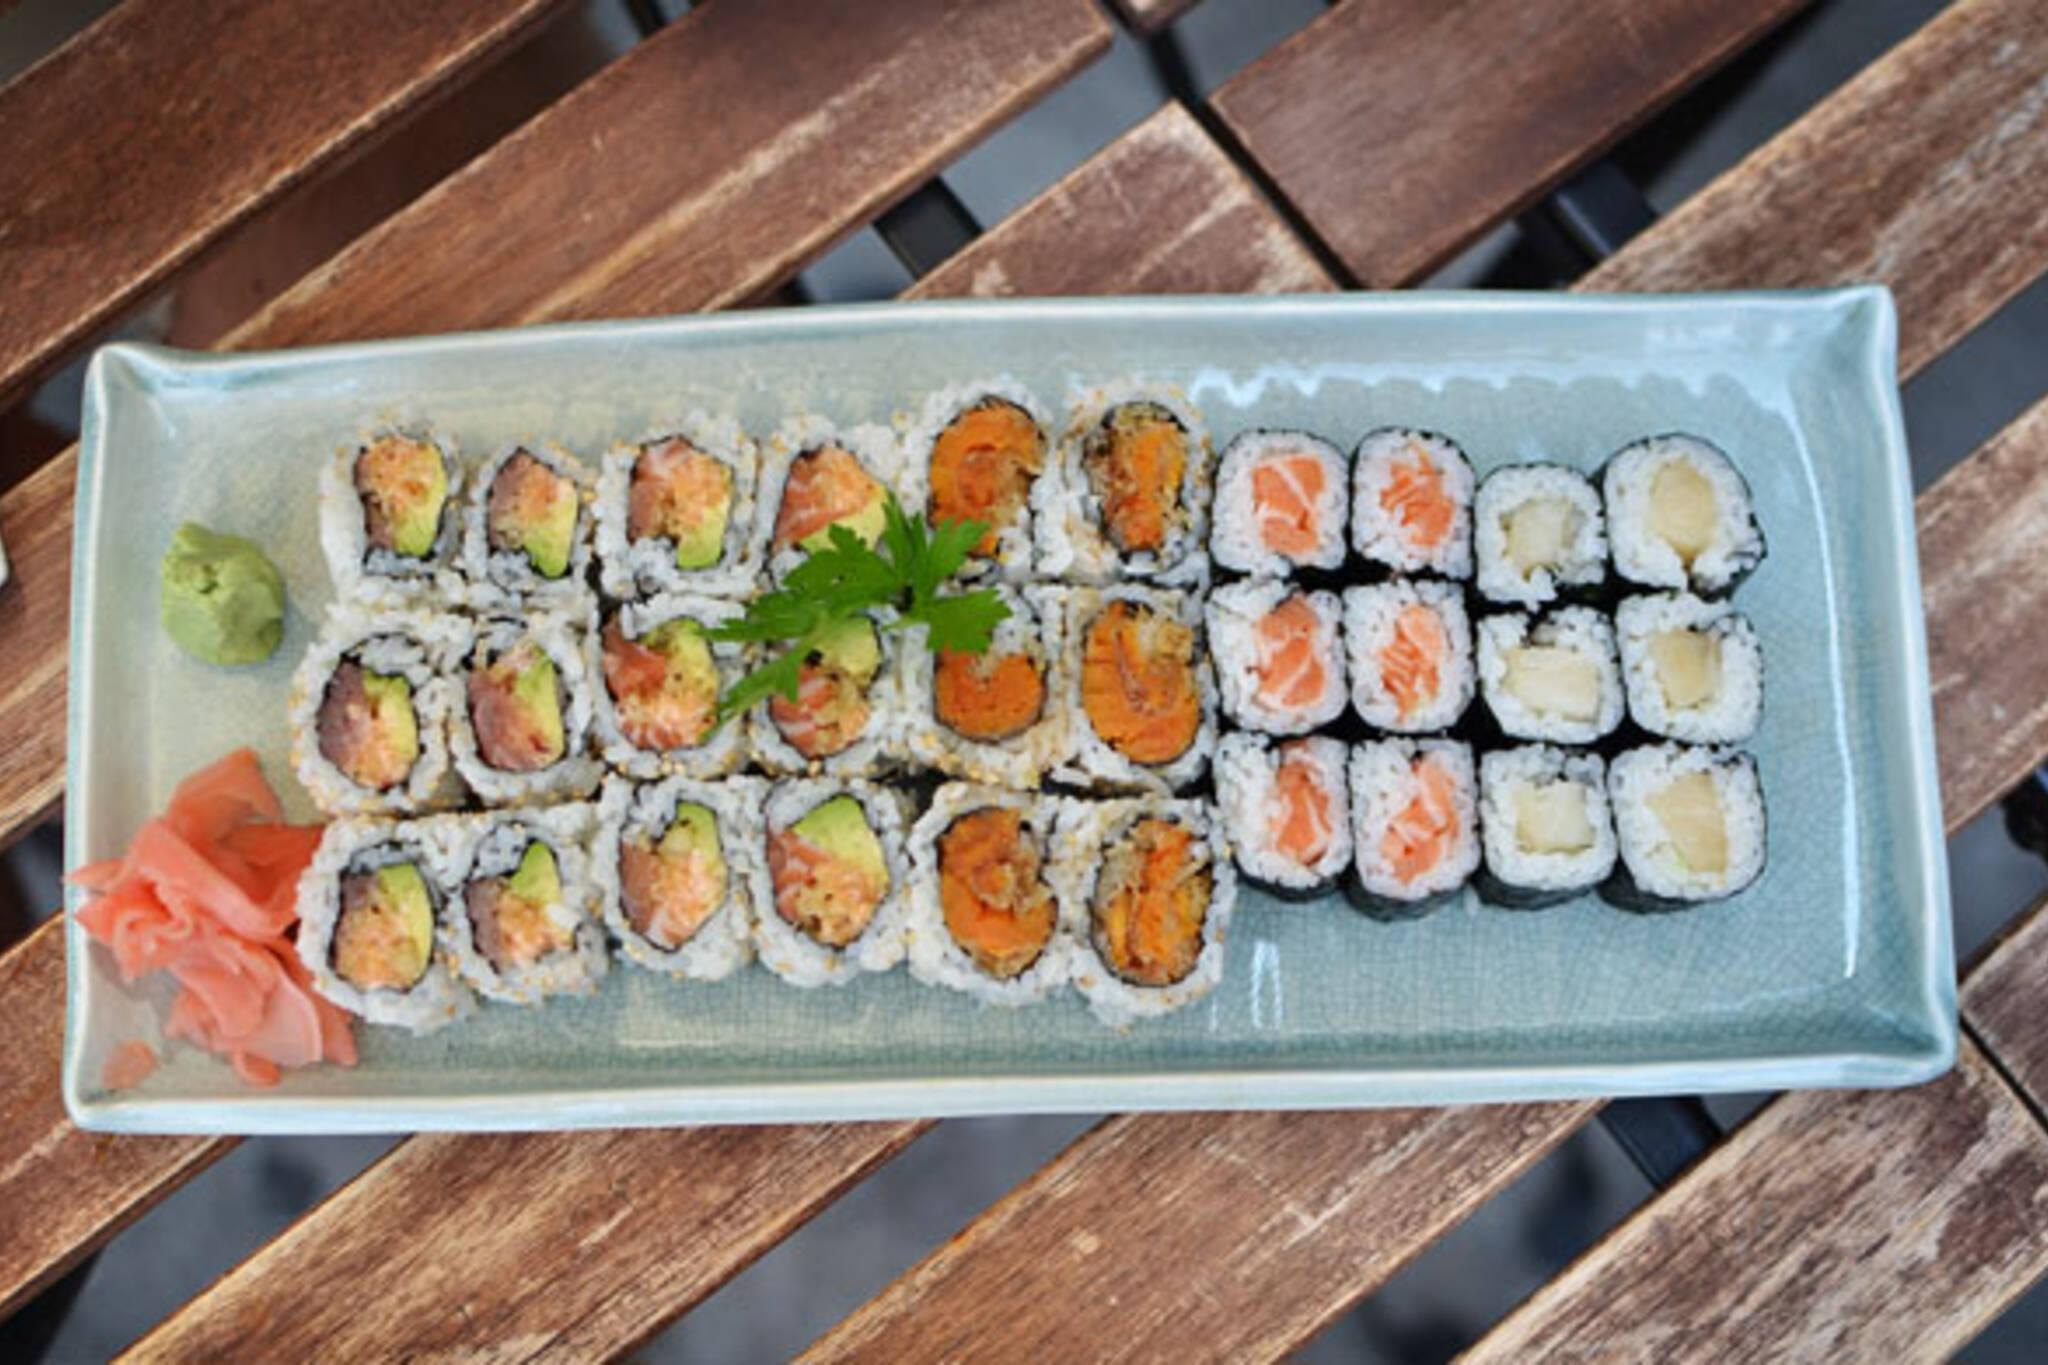 Sushi Kensington